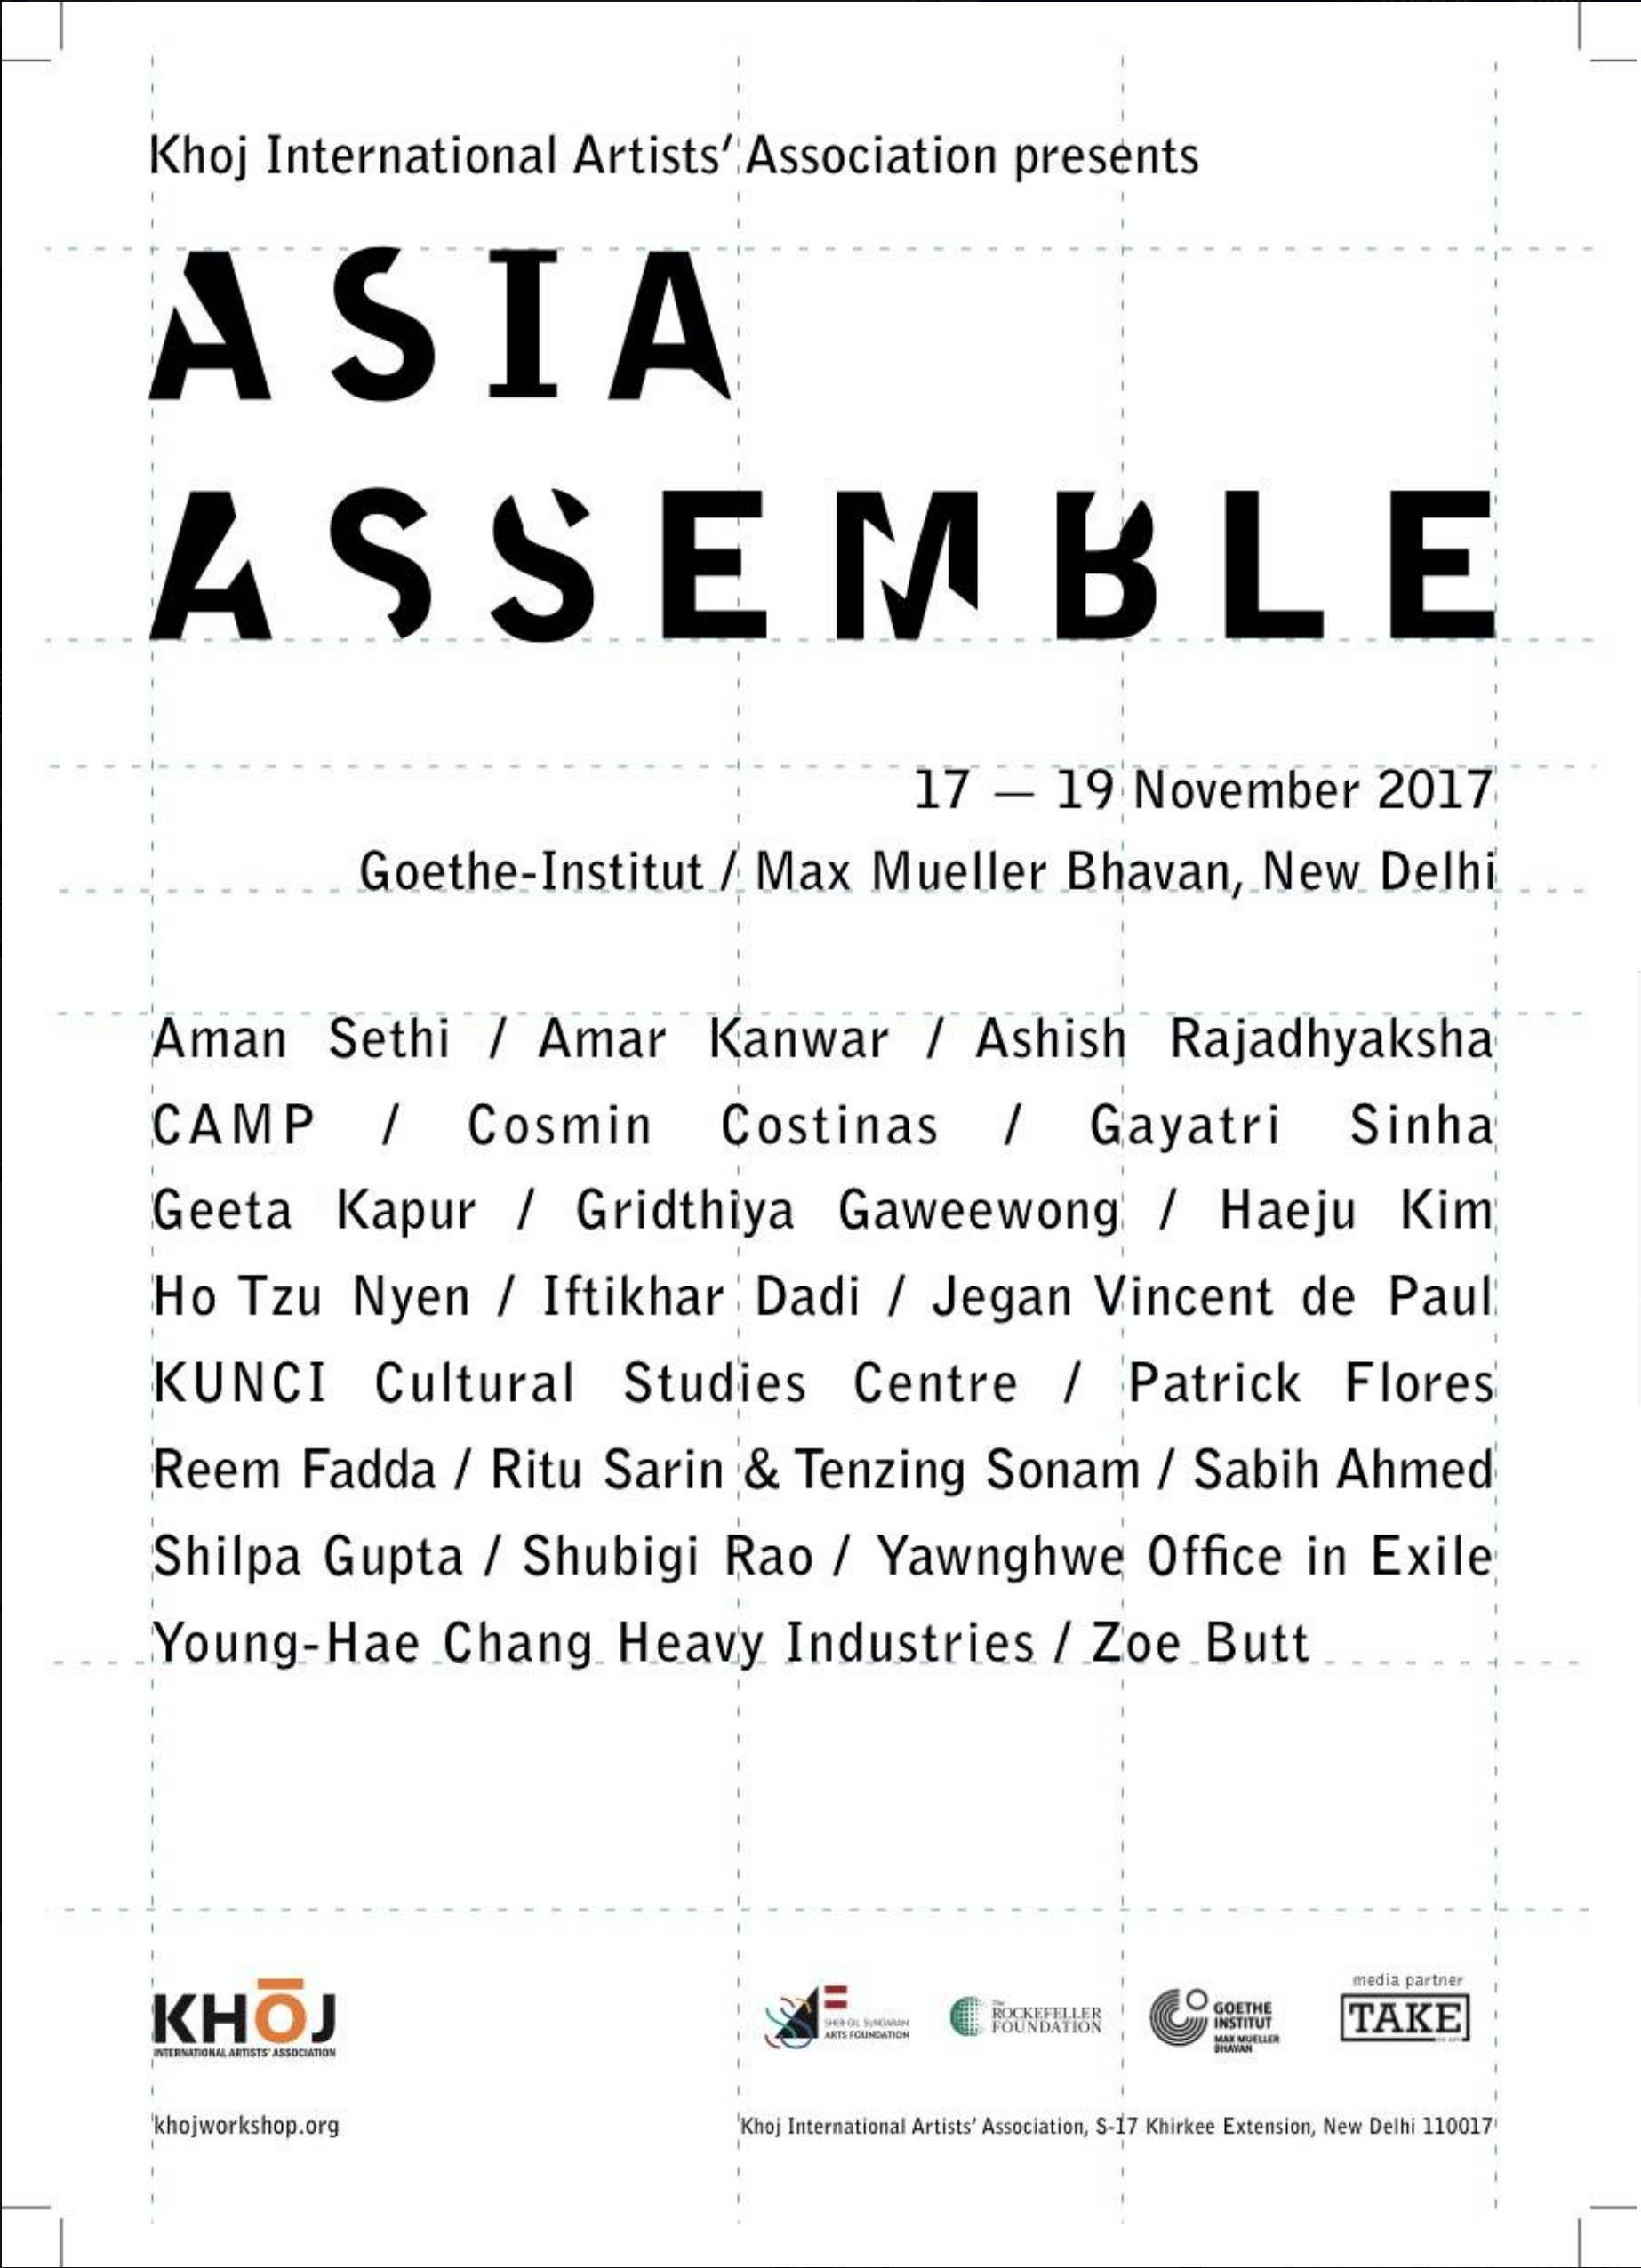 Asia Assemble poster.jpg